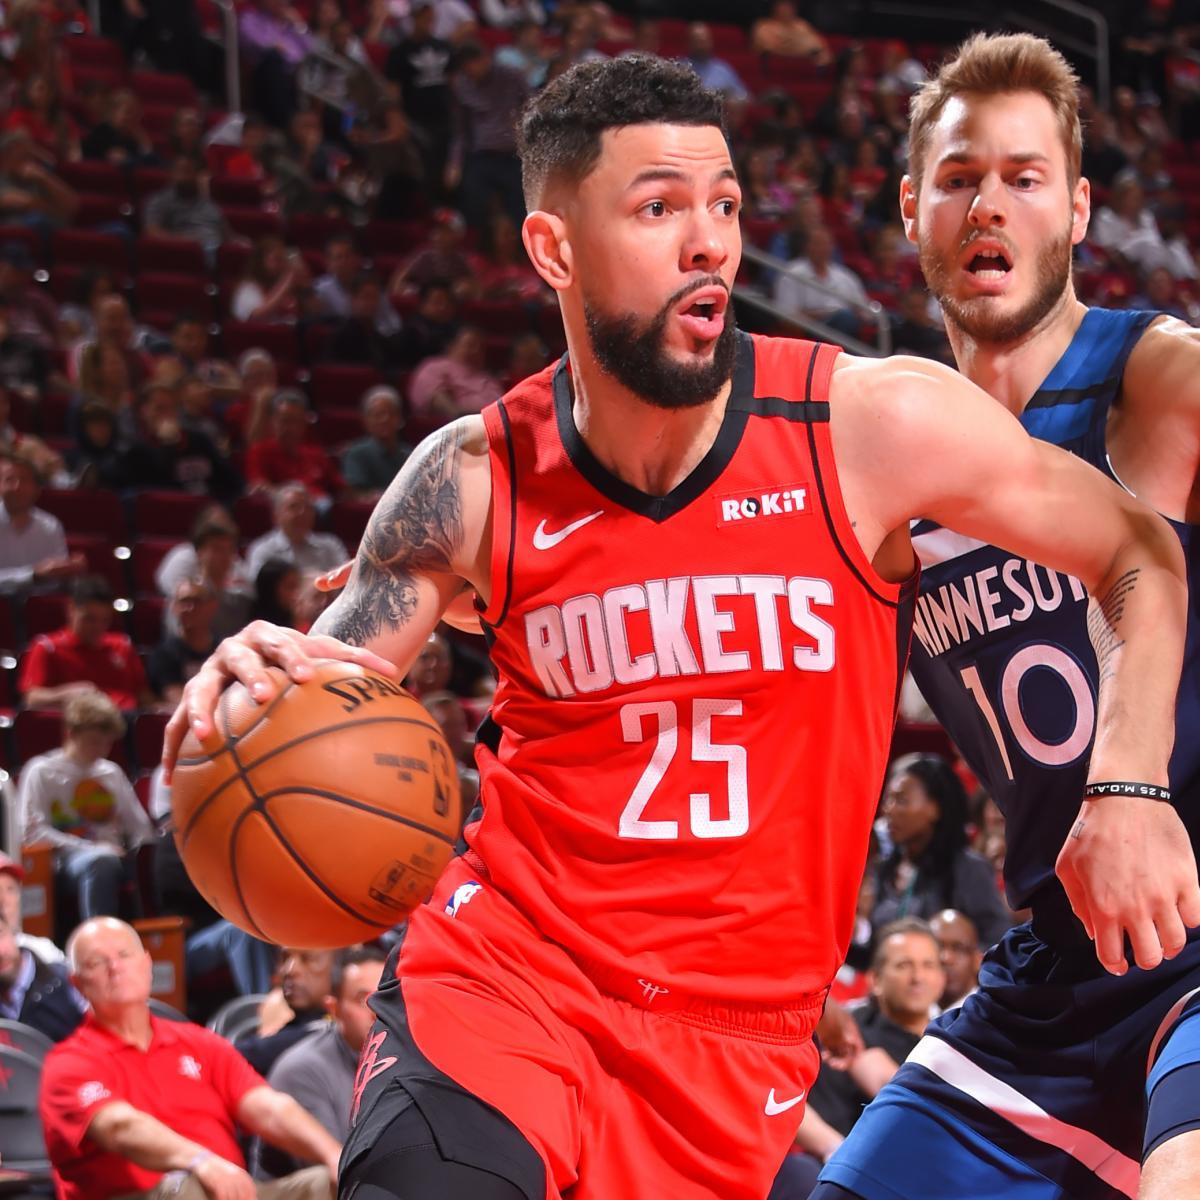 Rockets' Austin Rivers: 2020 NBA Finals Will Be 1 of ...